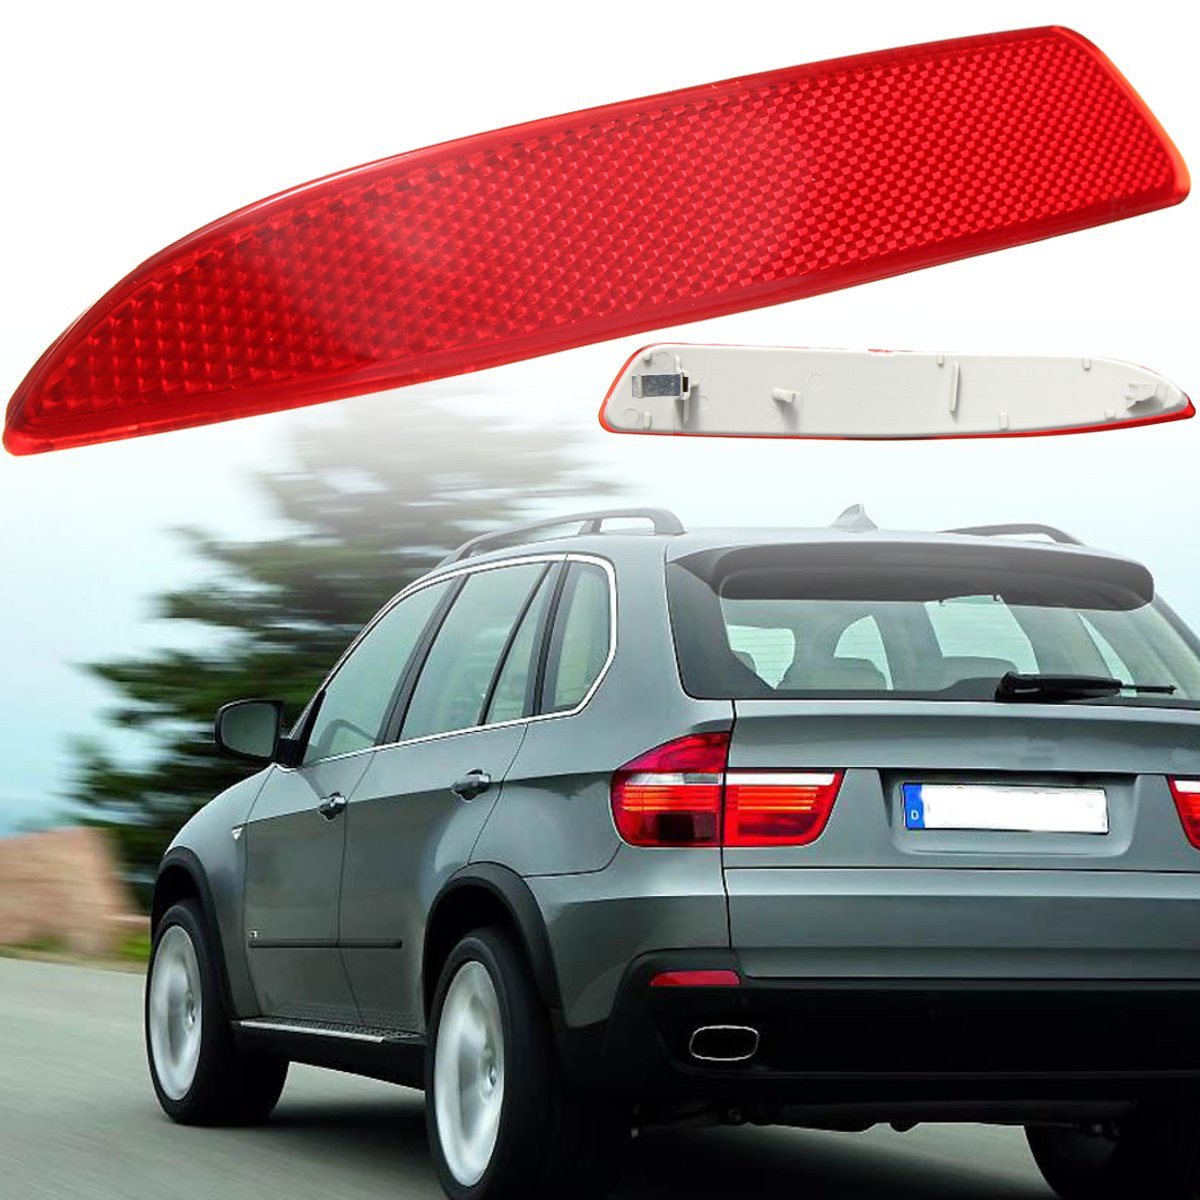 Right Passenger Side Rear Bumper Reflector Light Cover for BMW X5 E70 2007-2010